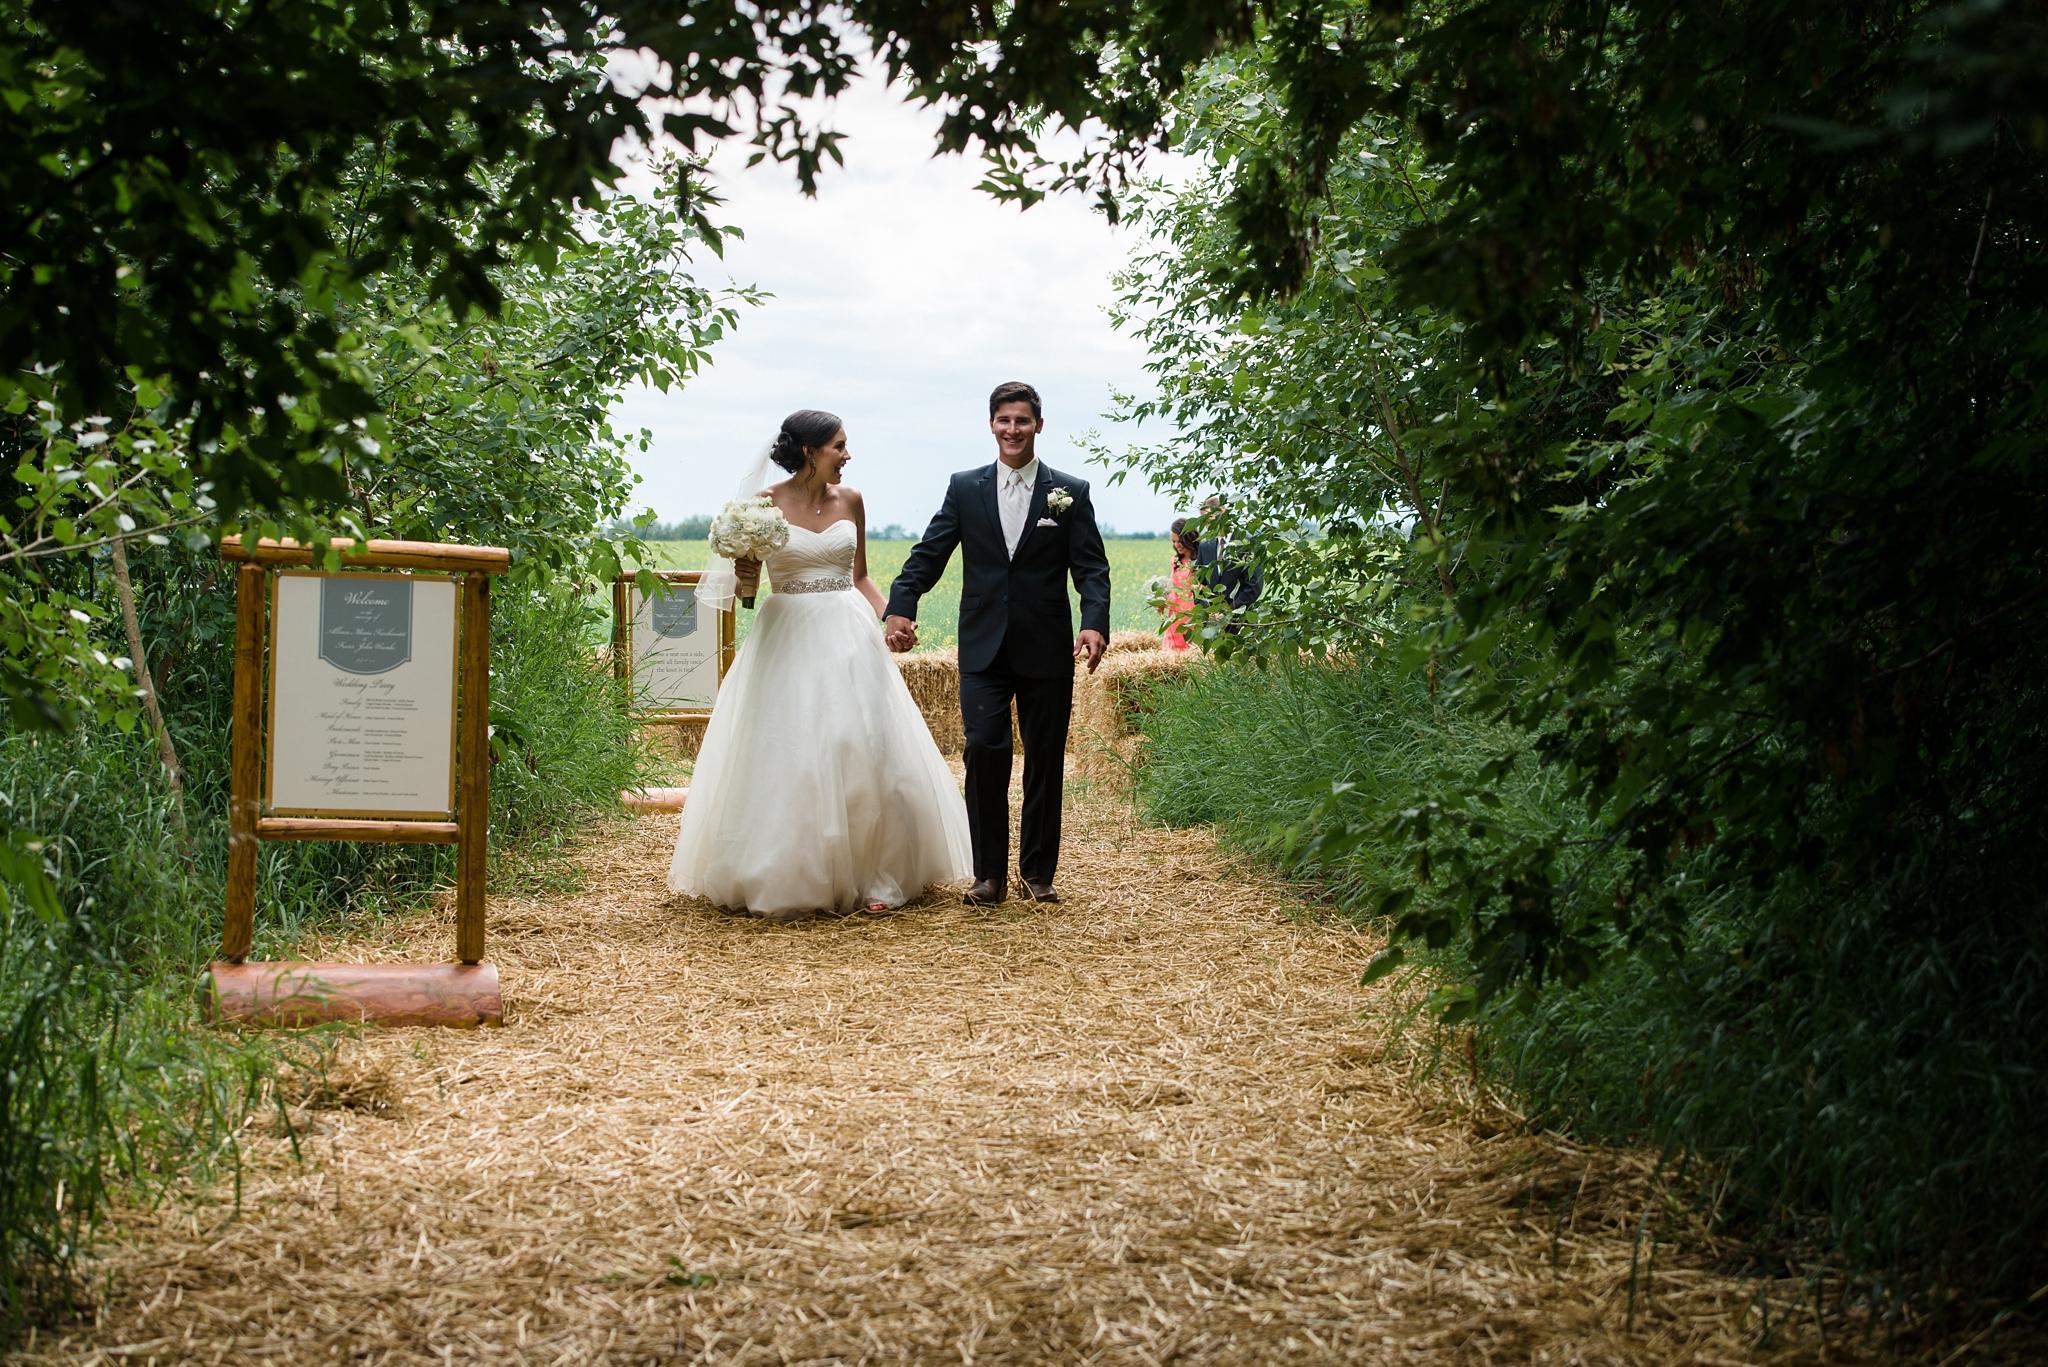 kaihla_tonai_intimate_wedding_elopement_photographer_0063